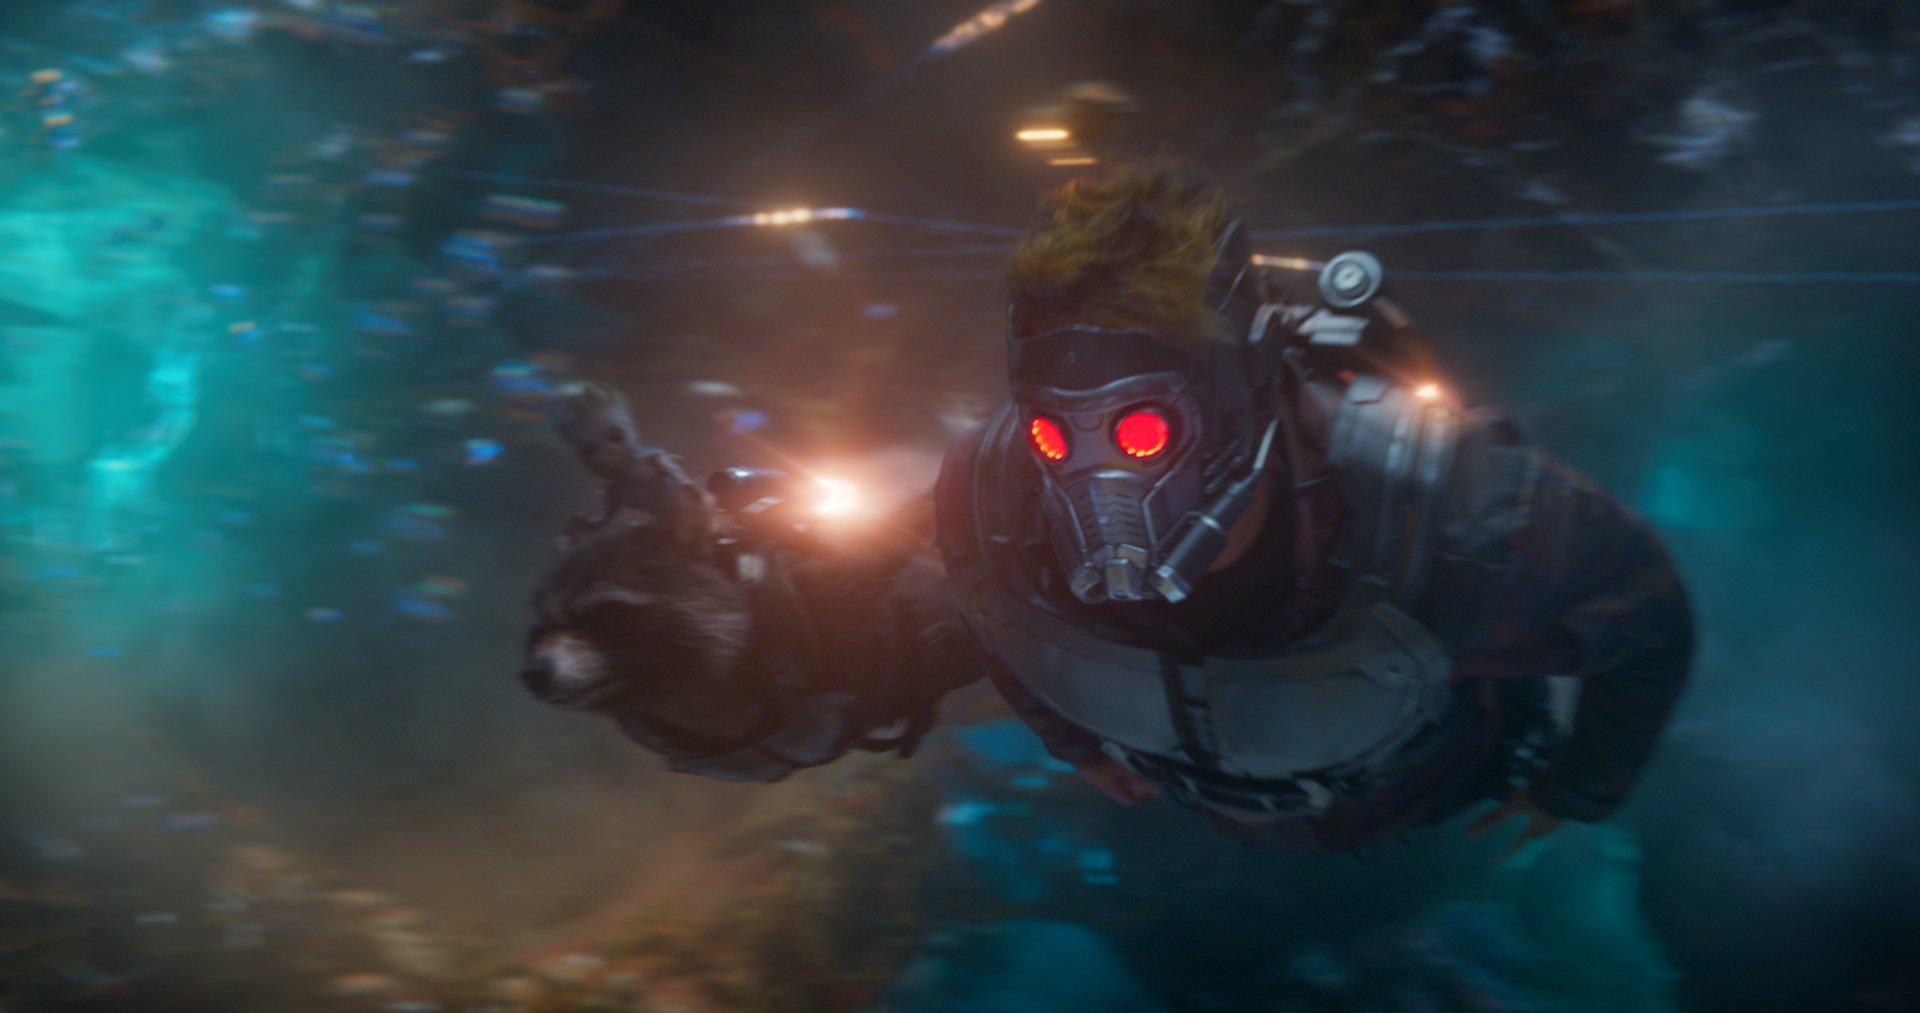 Movie - Guardians of the Galaxy Vol. 2  Star Lord Peter Quill Chris Pratt Wallpaper